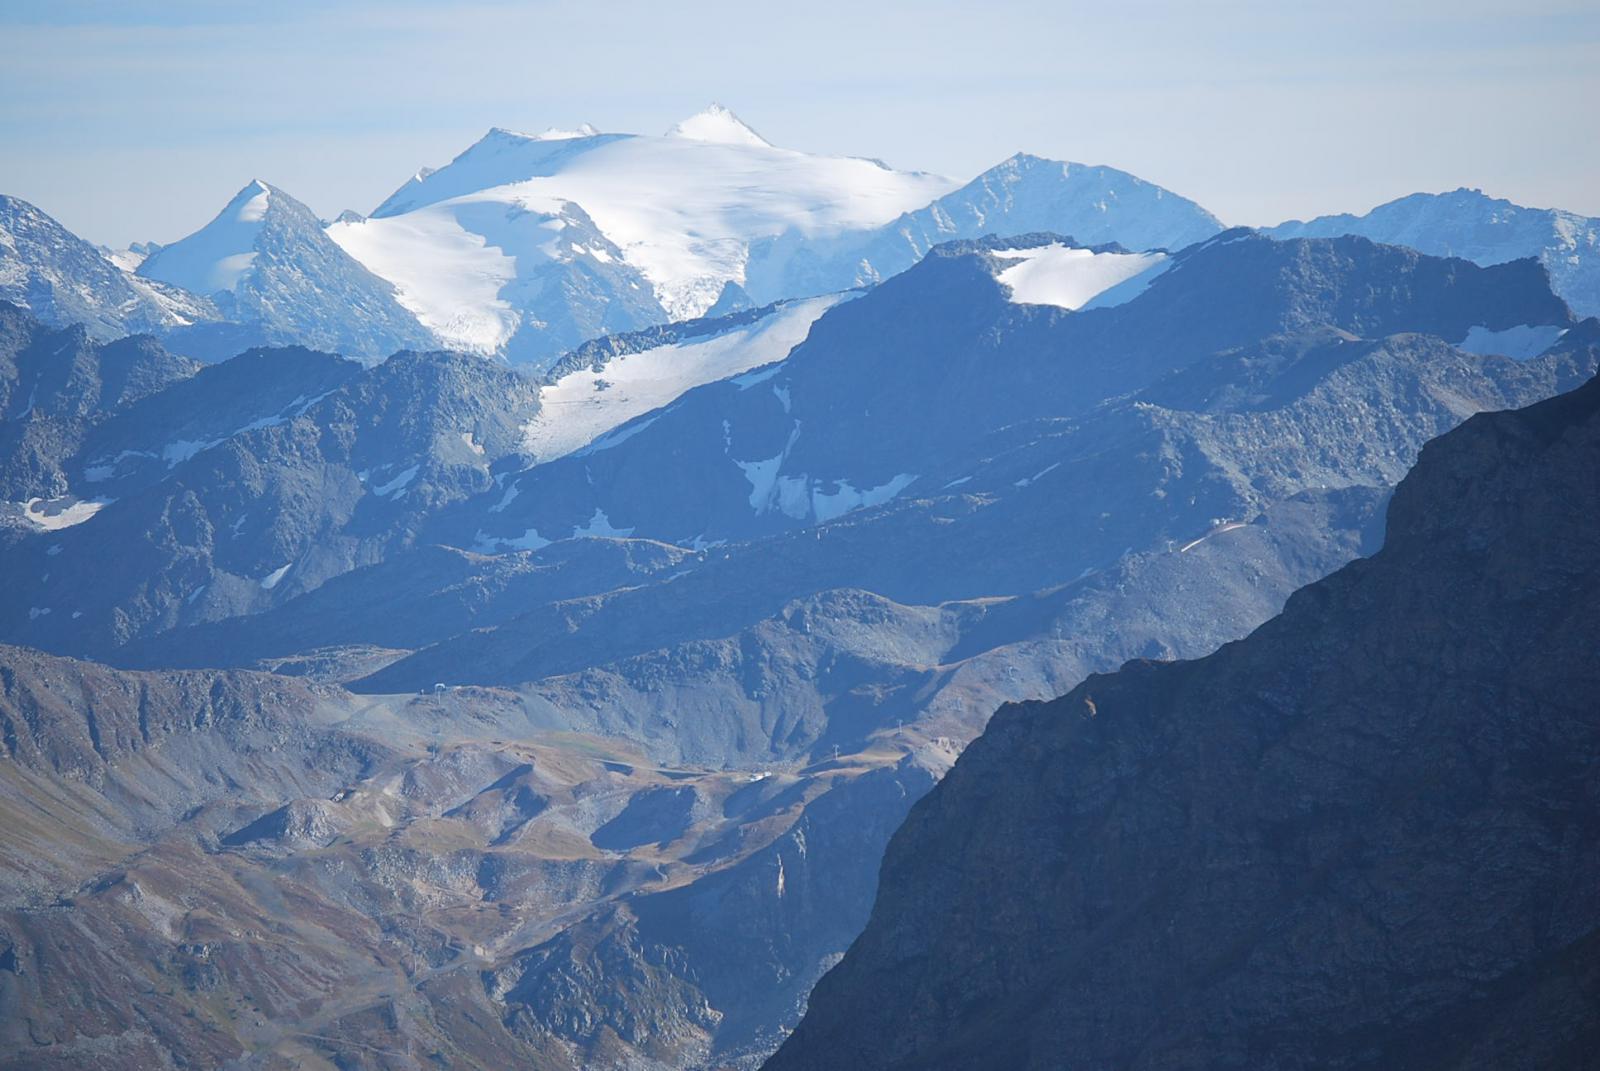 Ghiacciaio di Vaudet e Mt Freduaz